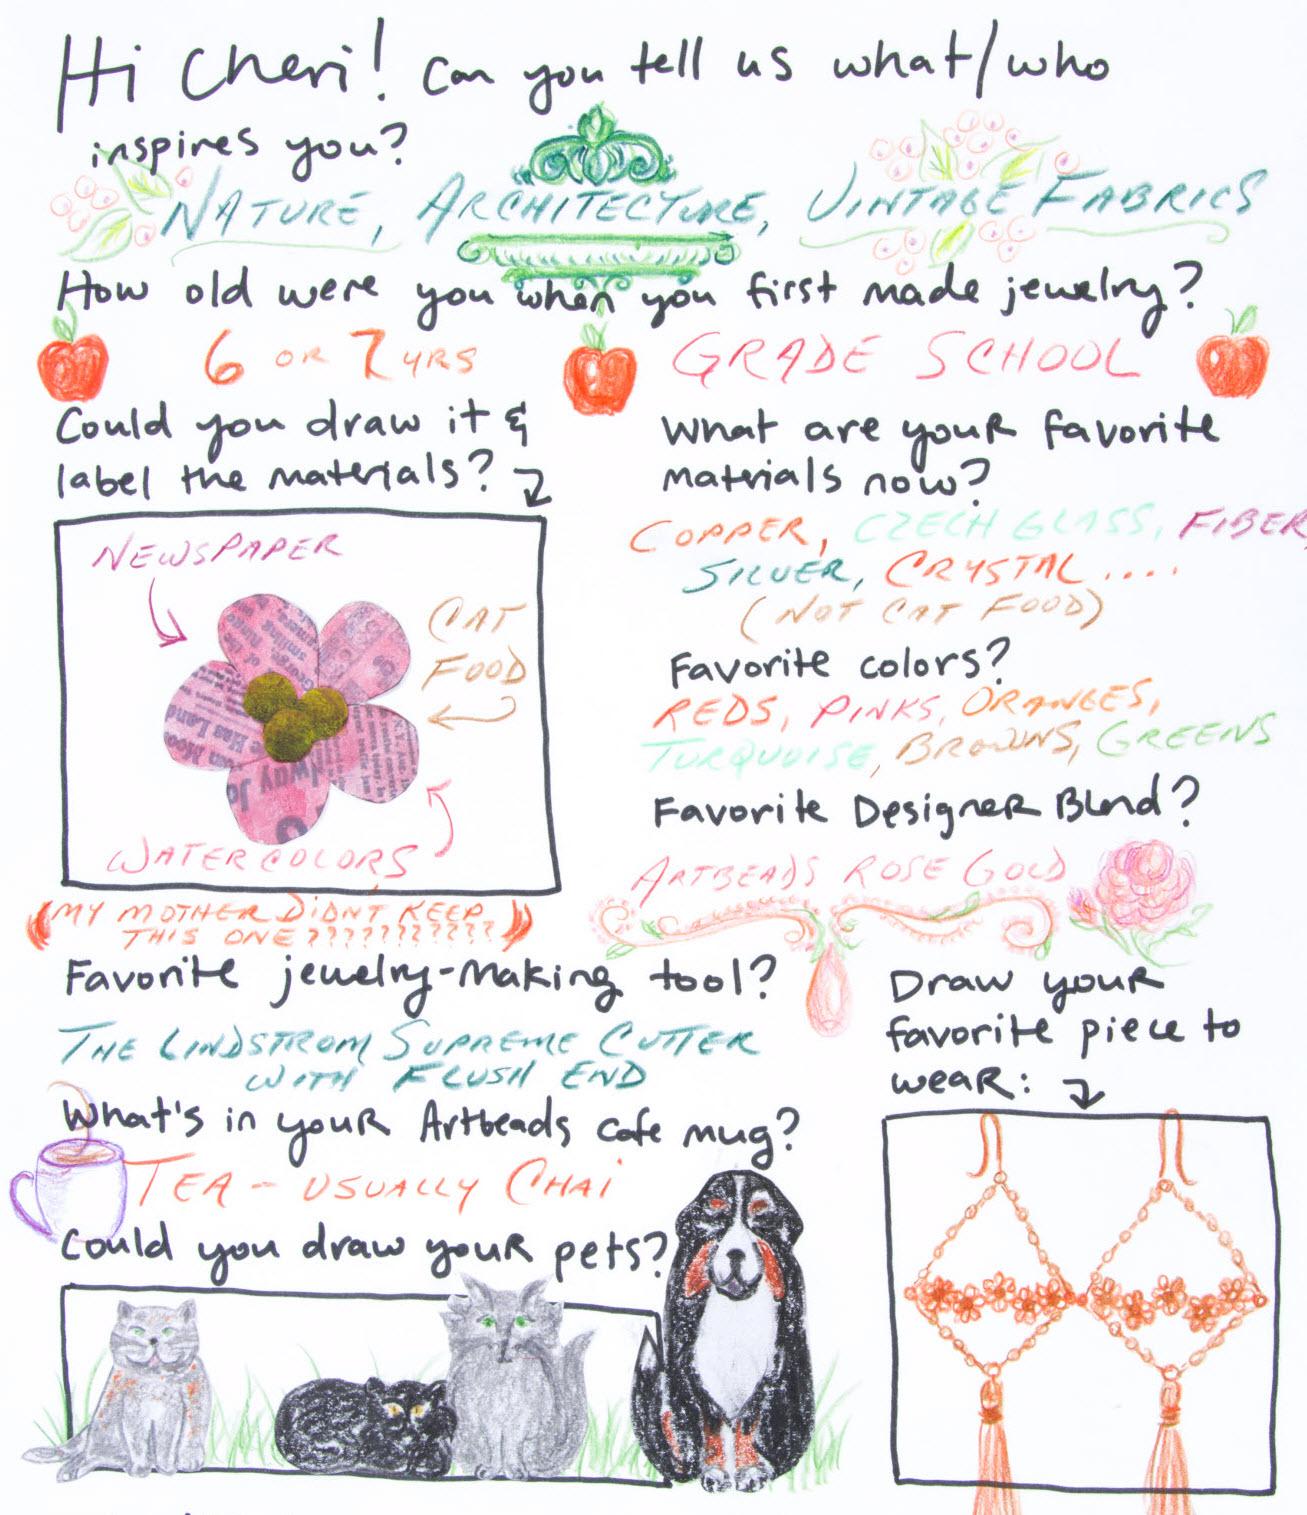 Cheri Carlson's Designer Profile